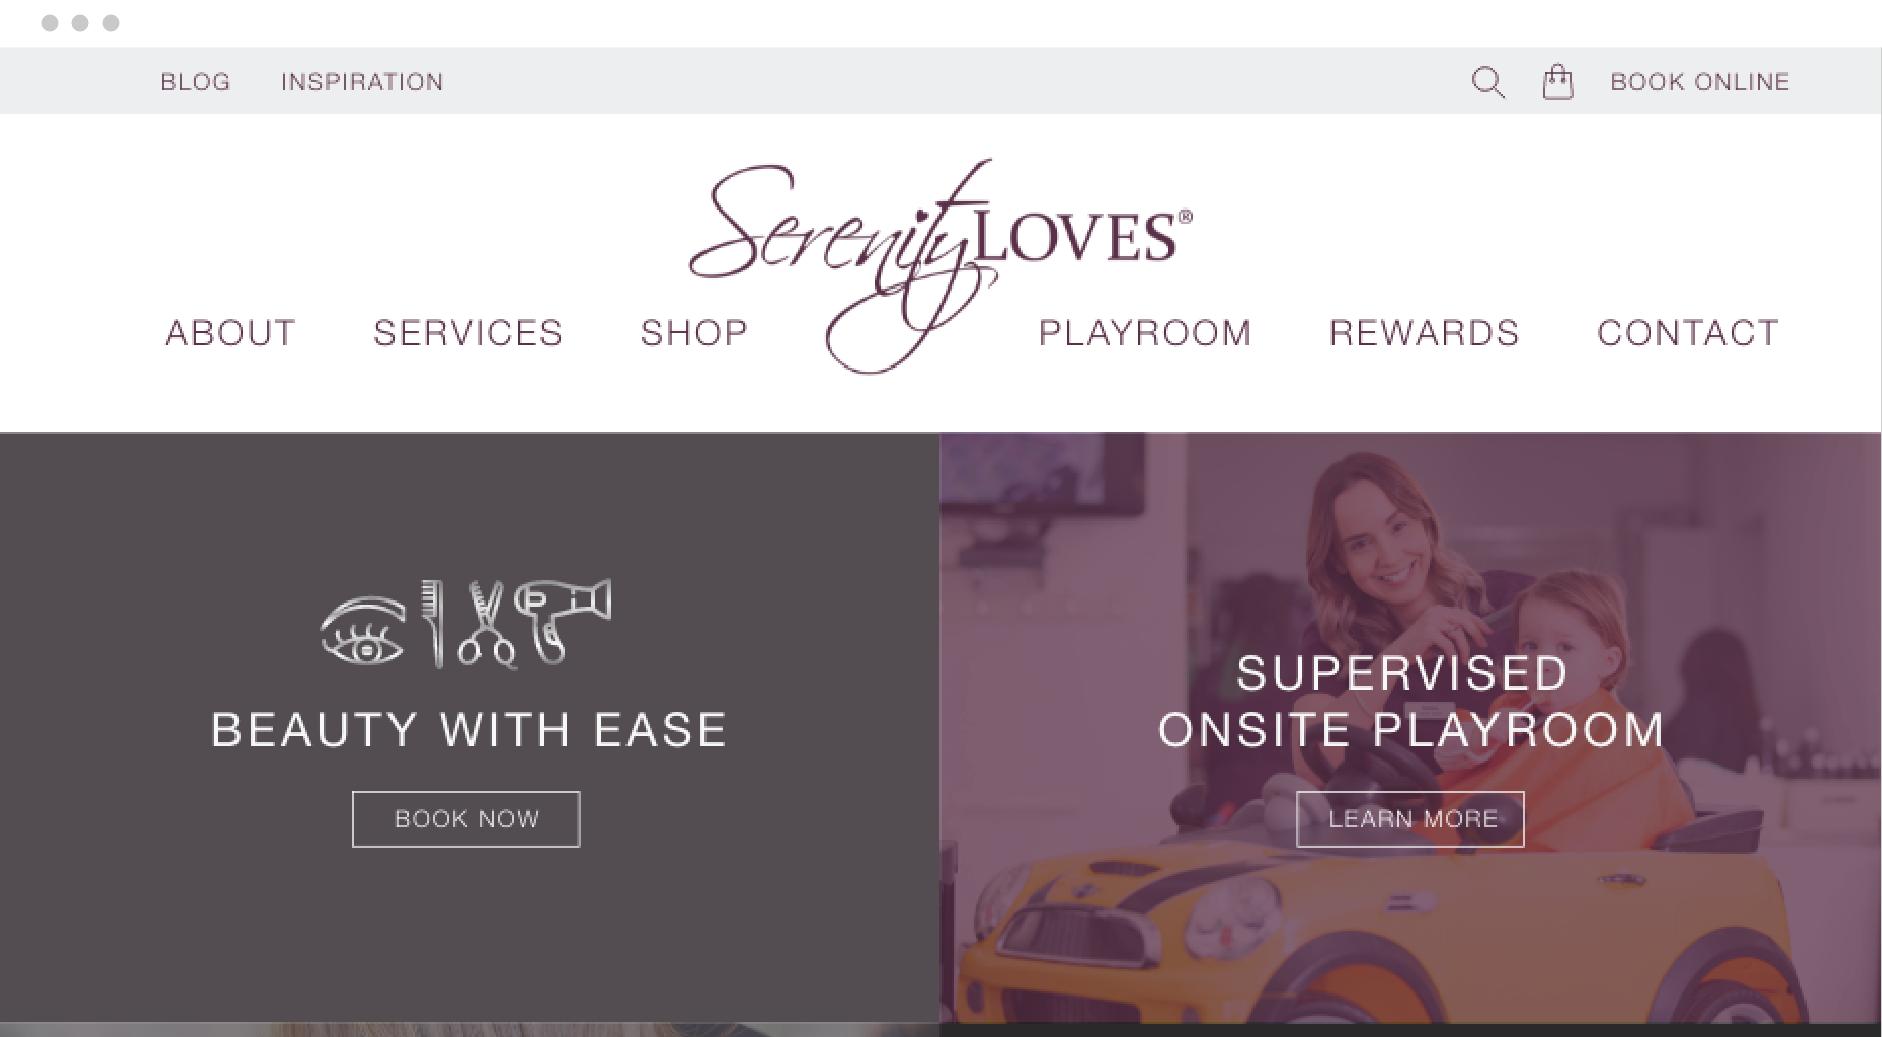 Serenity Loves website mockup in browser